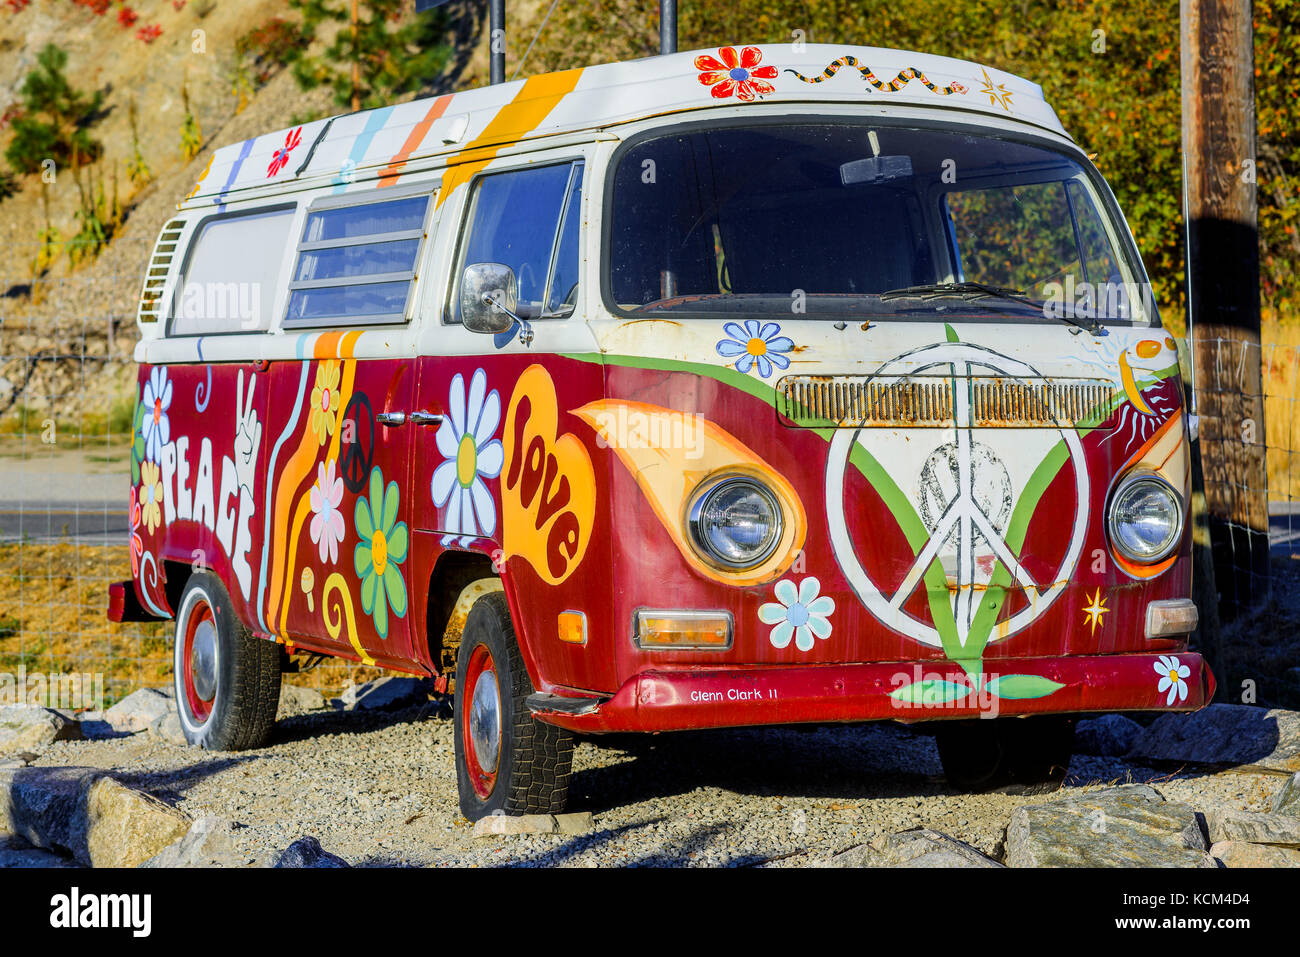 7295f098e6 Hippie Van Stock Photos   Hippie Van Stock Images - Alamy